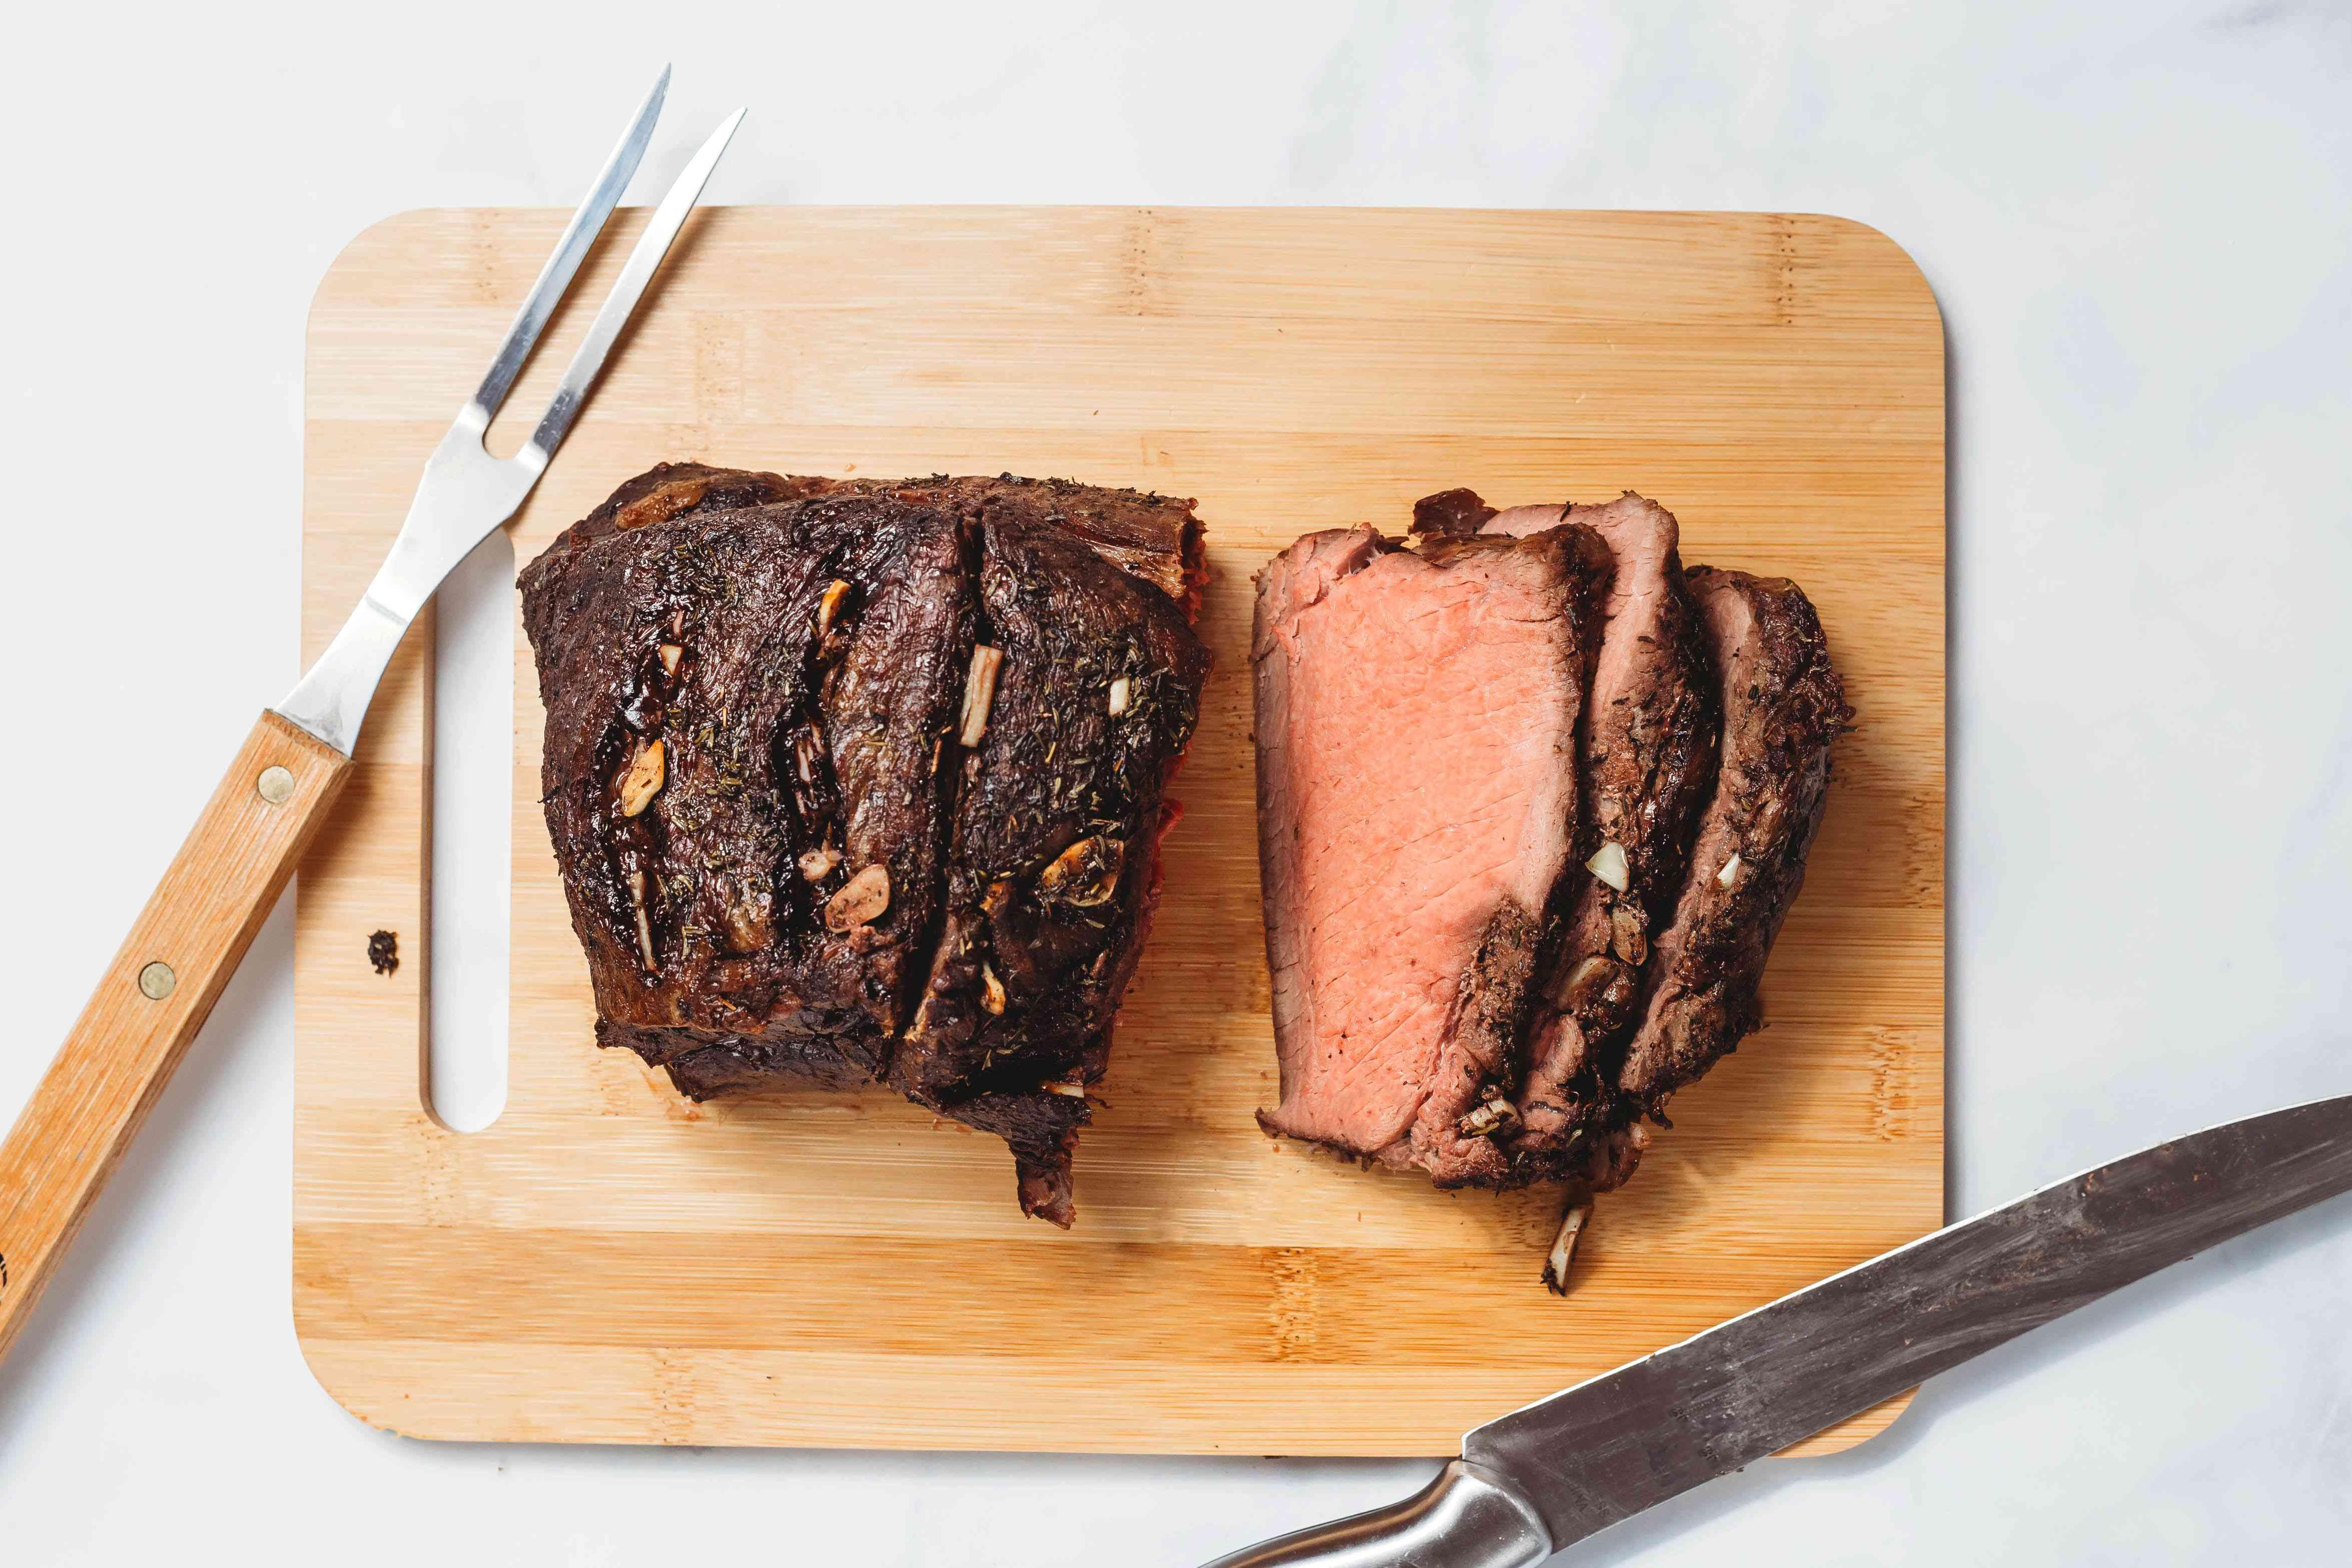 Boneless Top Sirloin Roast sliced on a cutting board